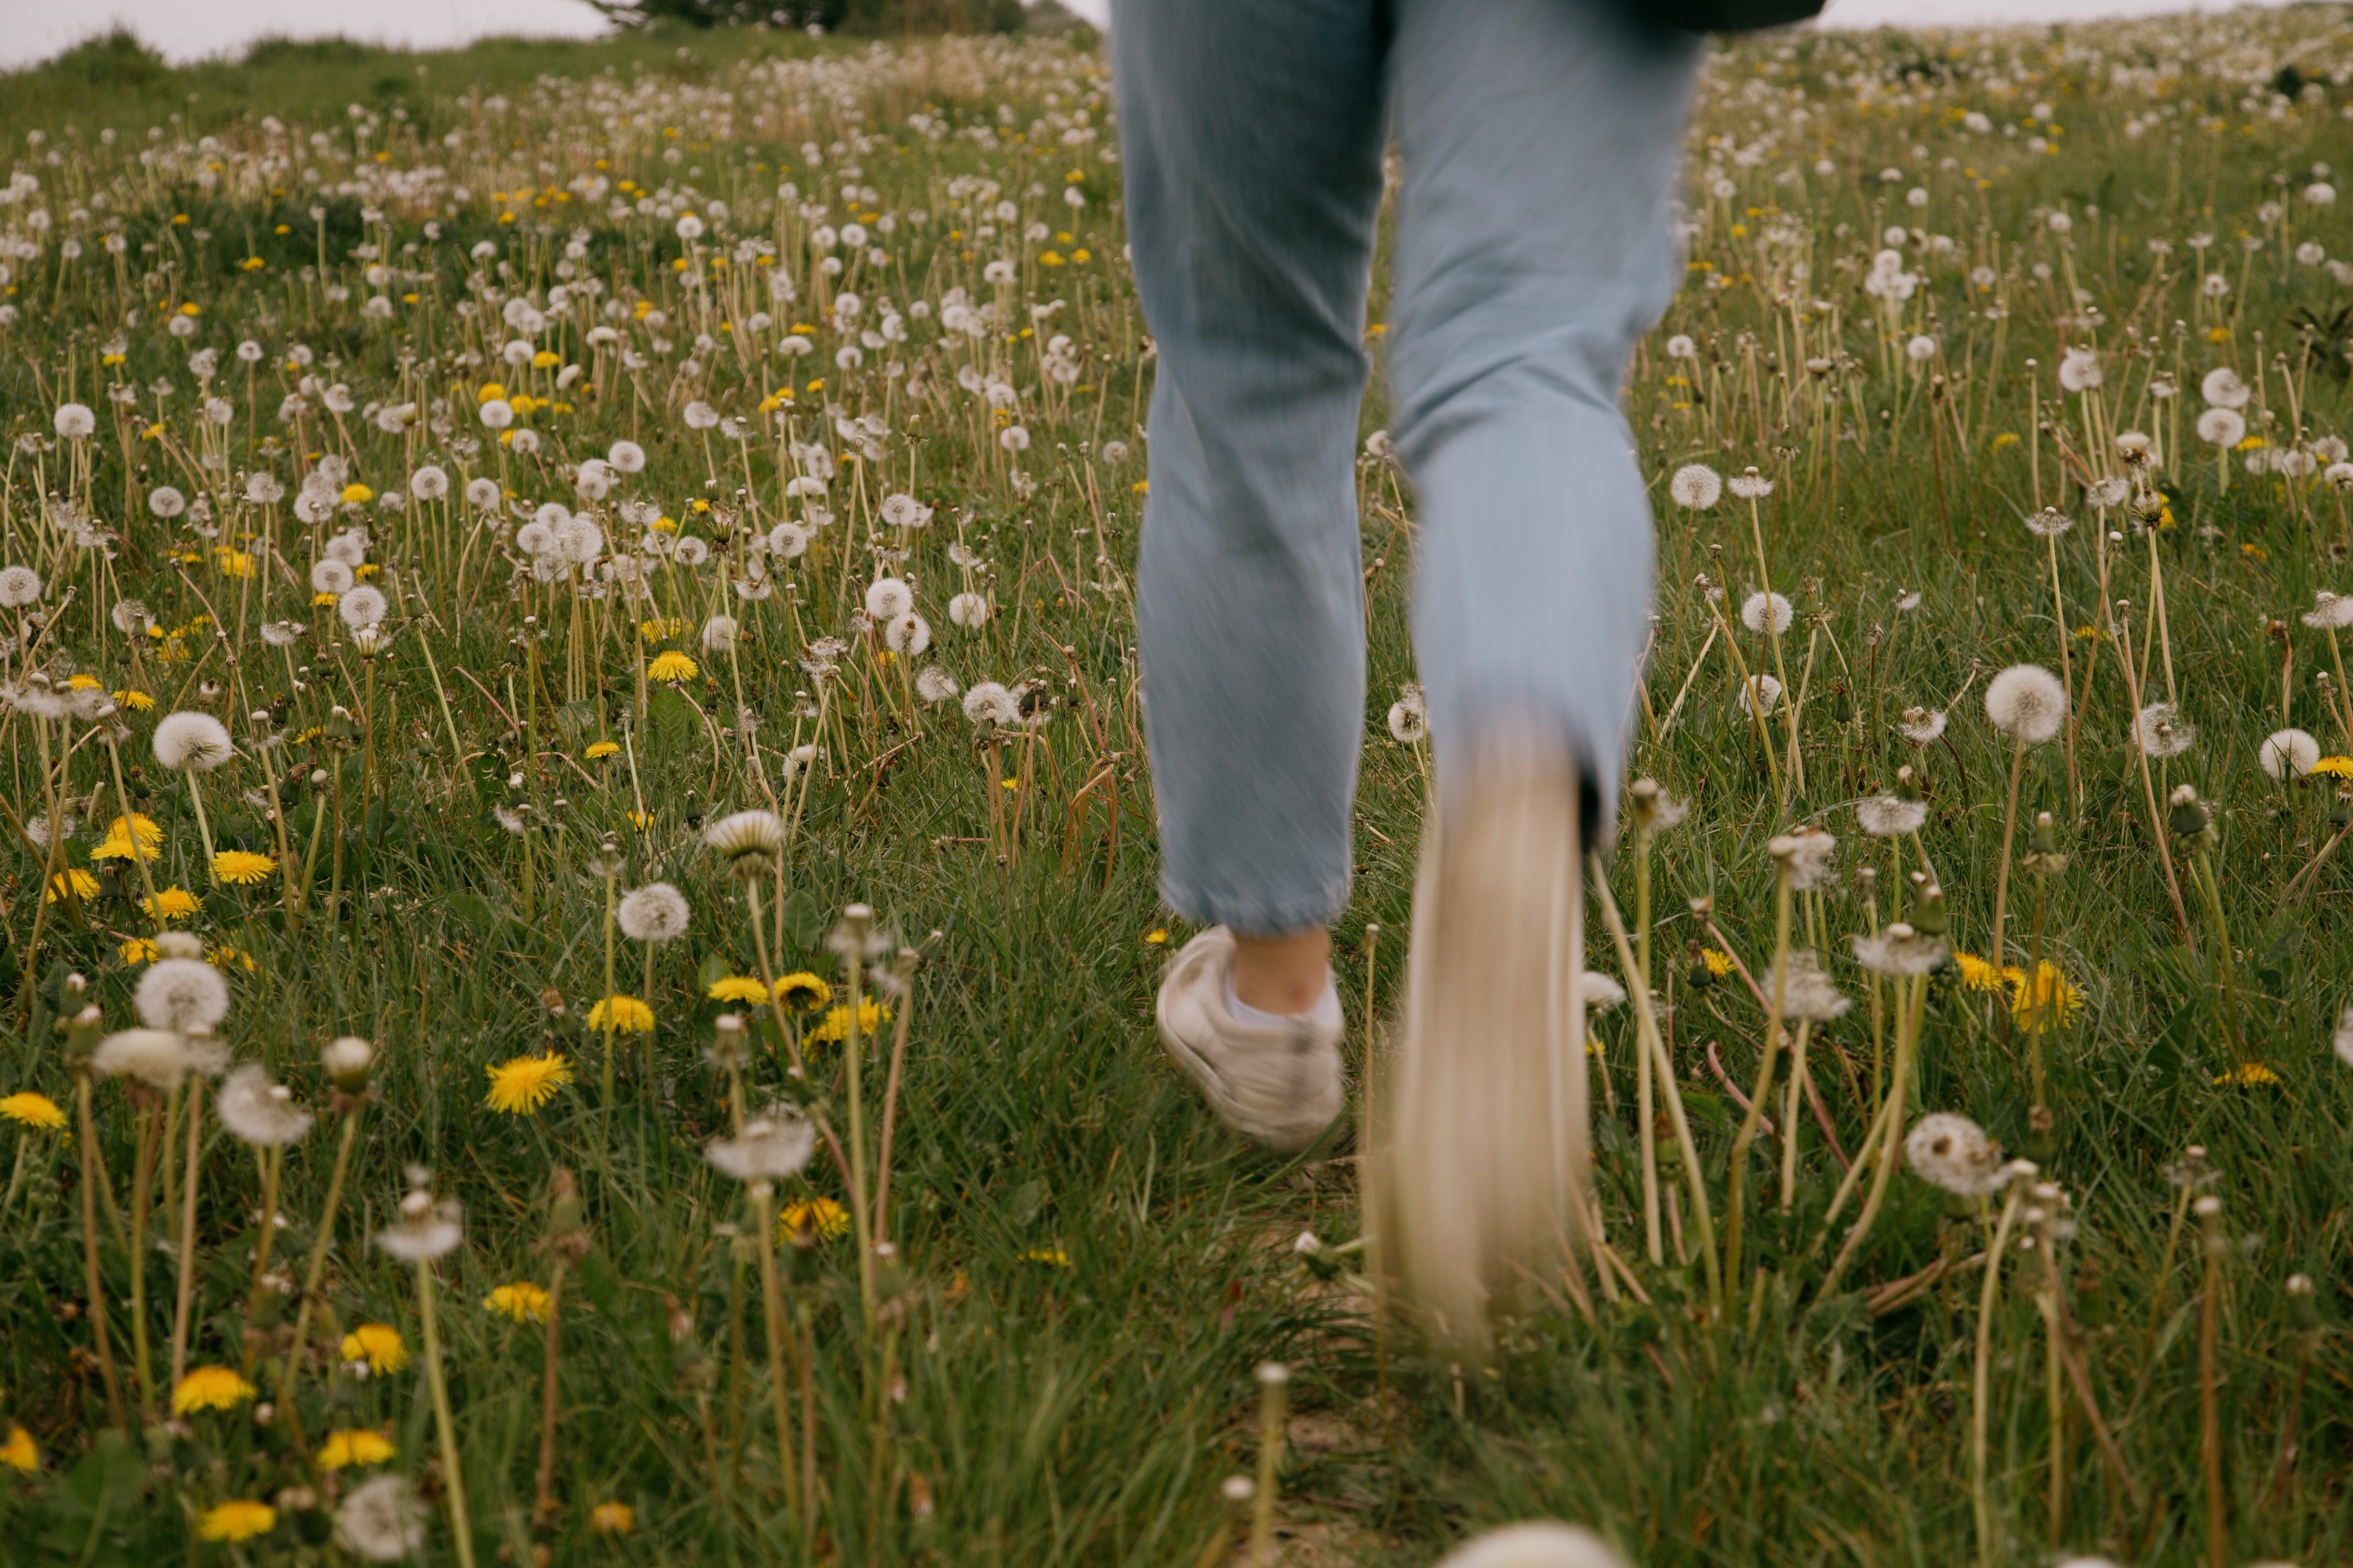 Girl Running Through Flowers